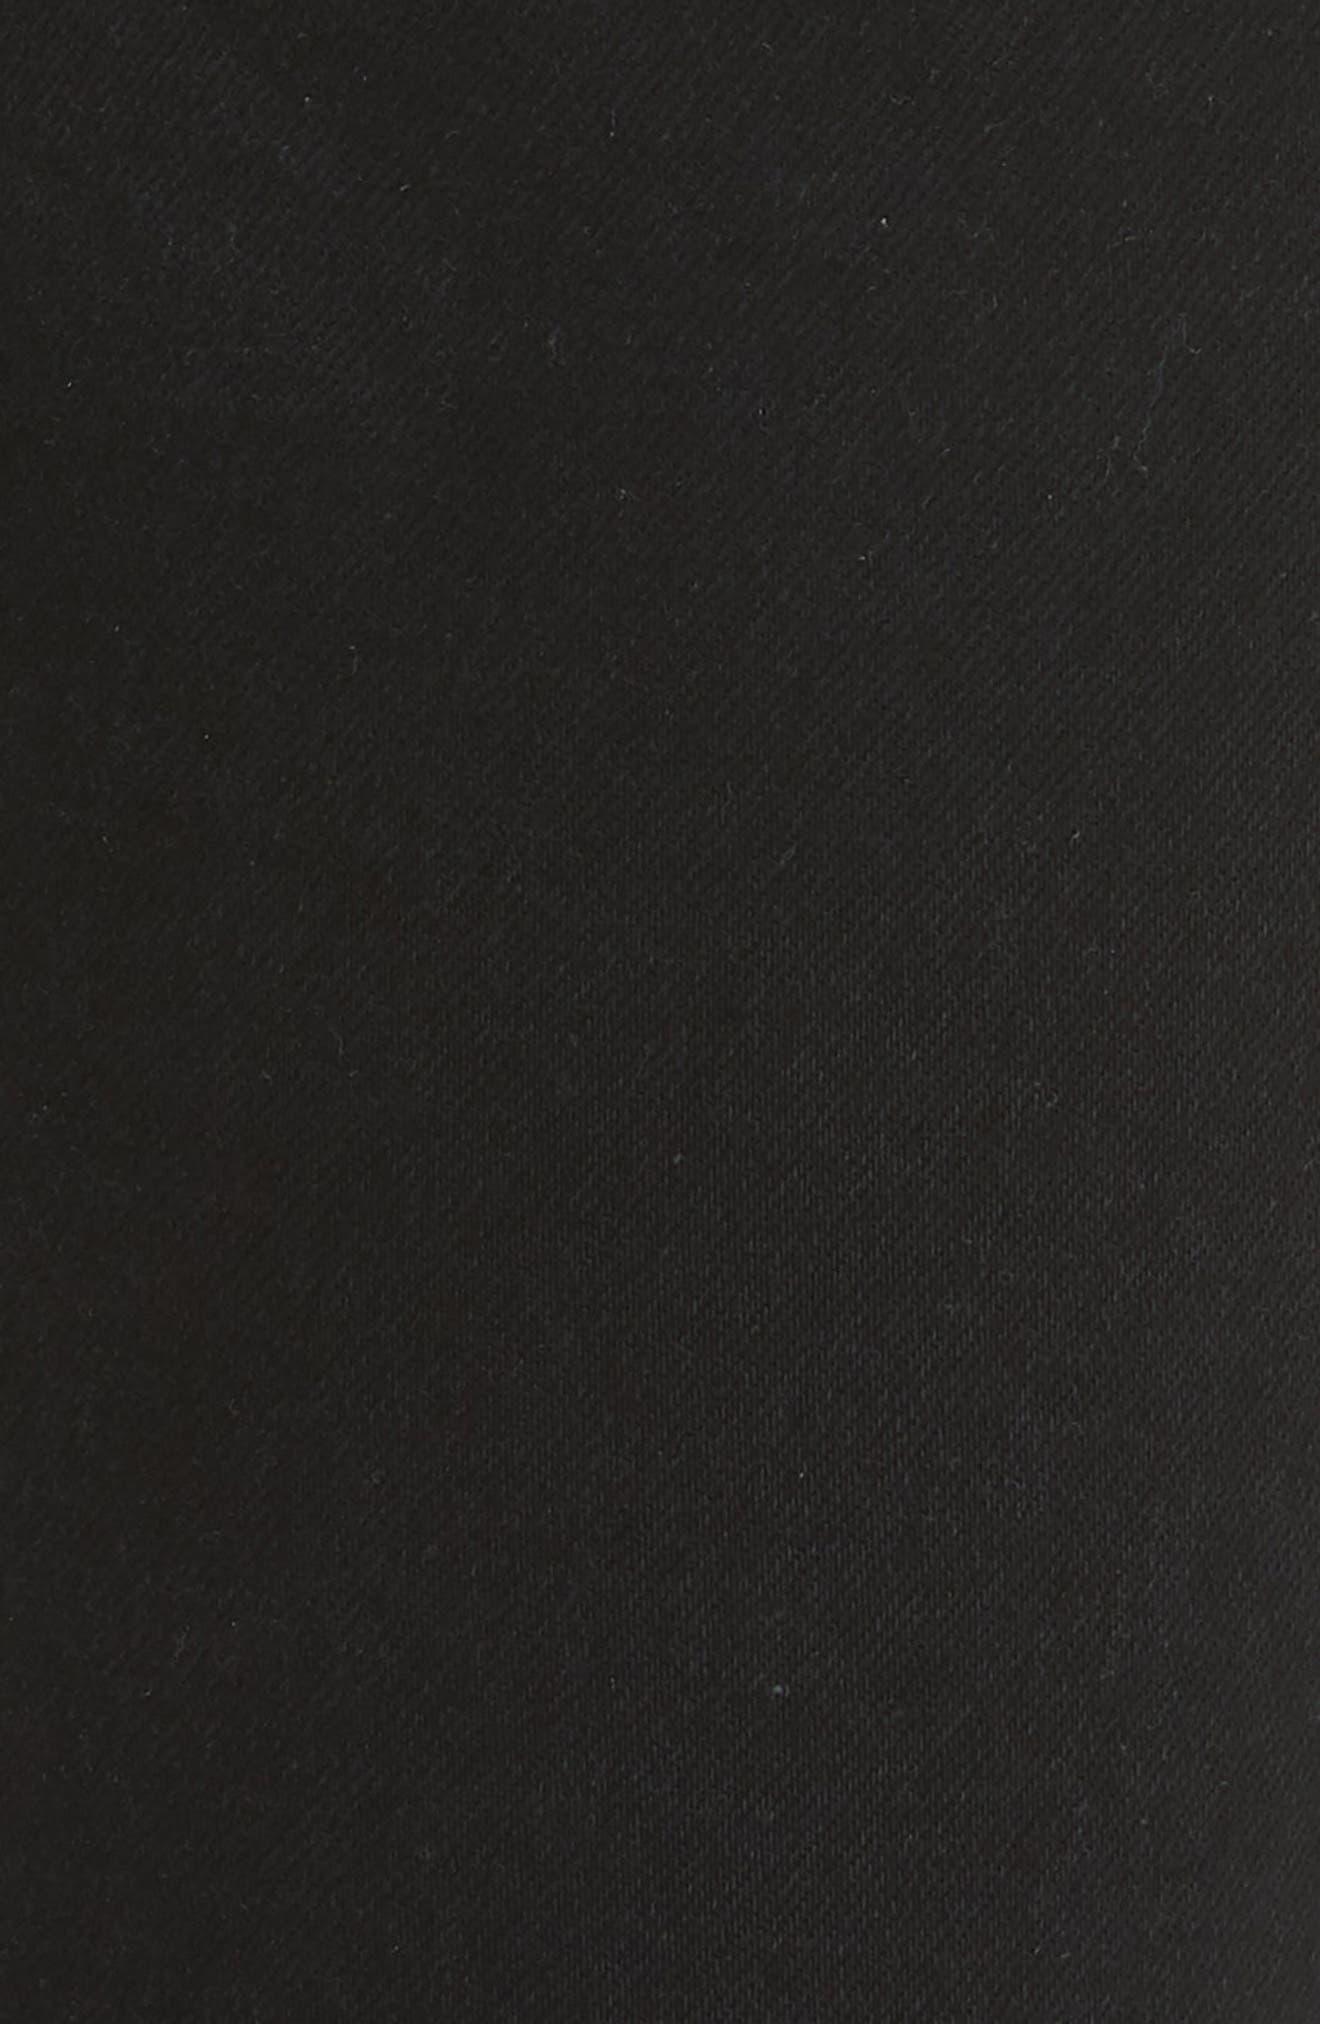 High Waist Stretch Ankle Jeans,                             Alternate thumbnail 6, color,                             BLACK DESTROY